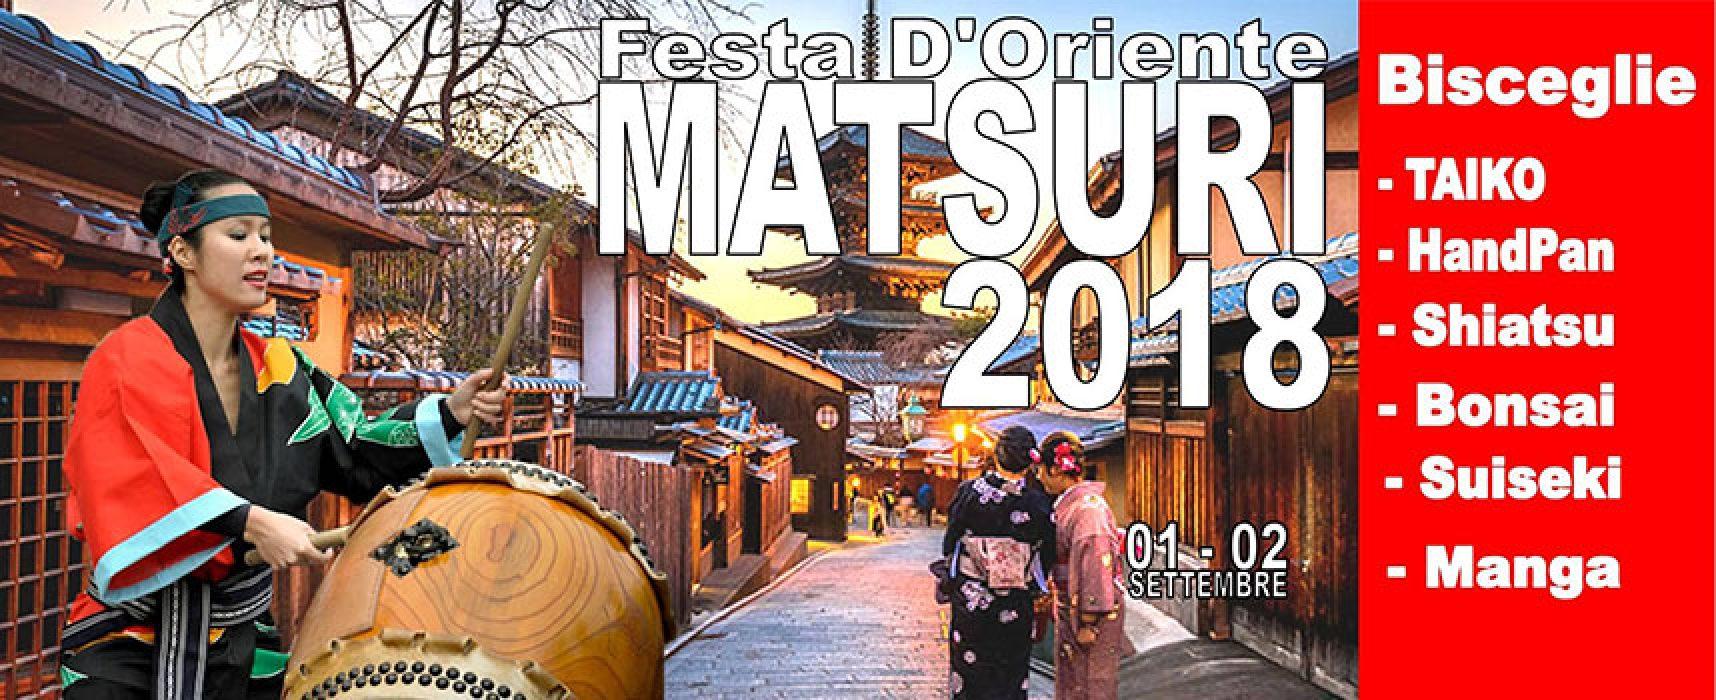 Matsuri Festival d'Oriente, la cultura nipponica approda in tre serate a Bisceglie